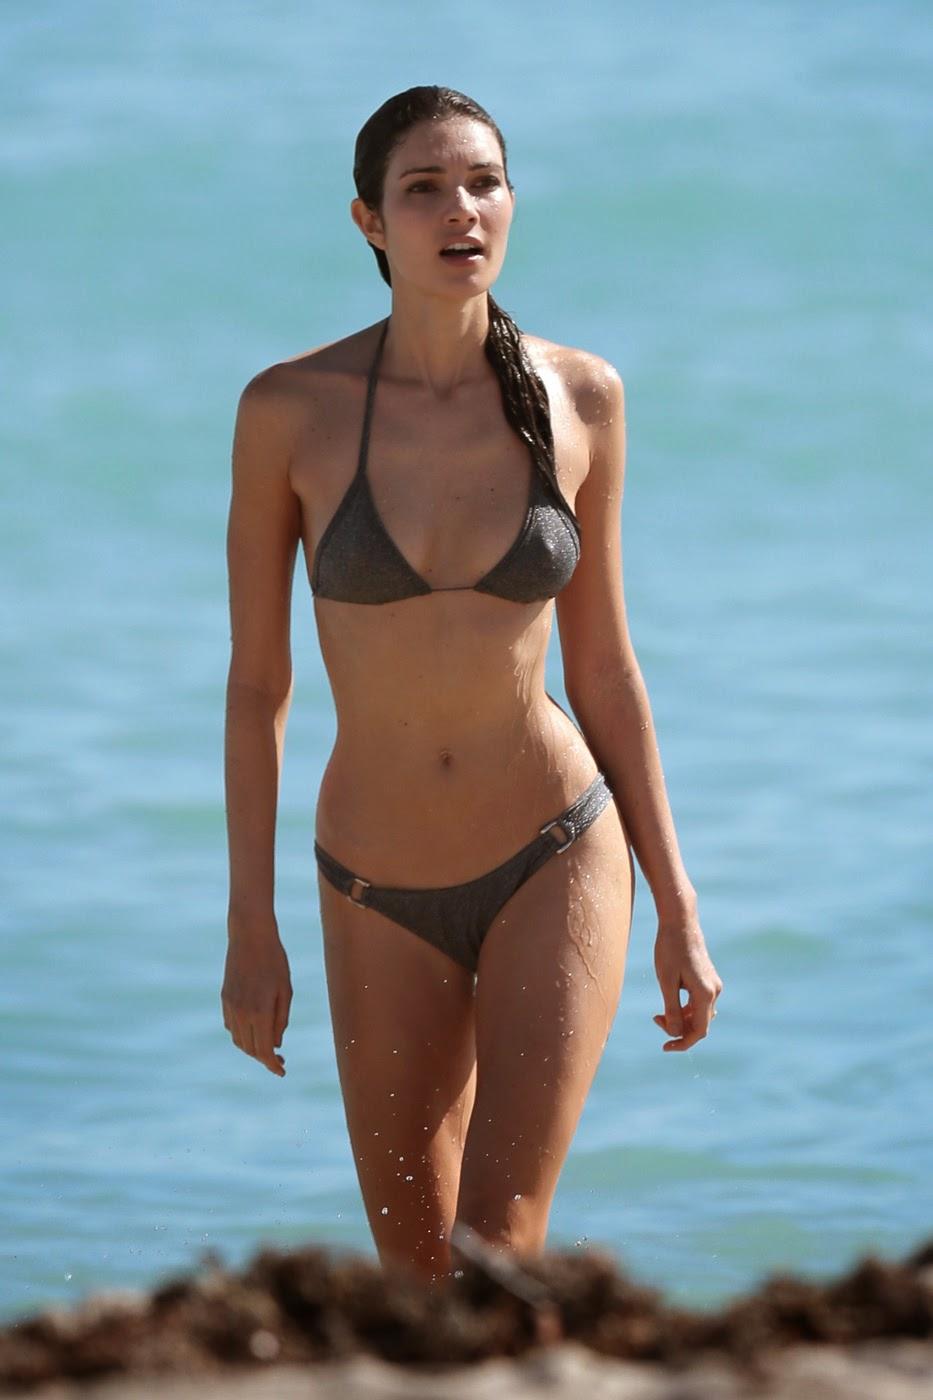 fashion model Teresa Moore bikini on the beach photo 6